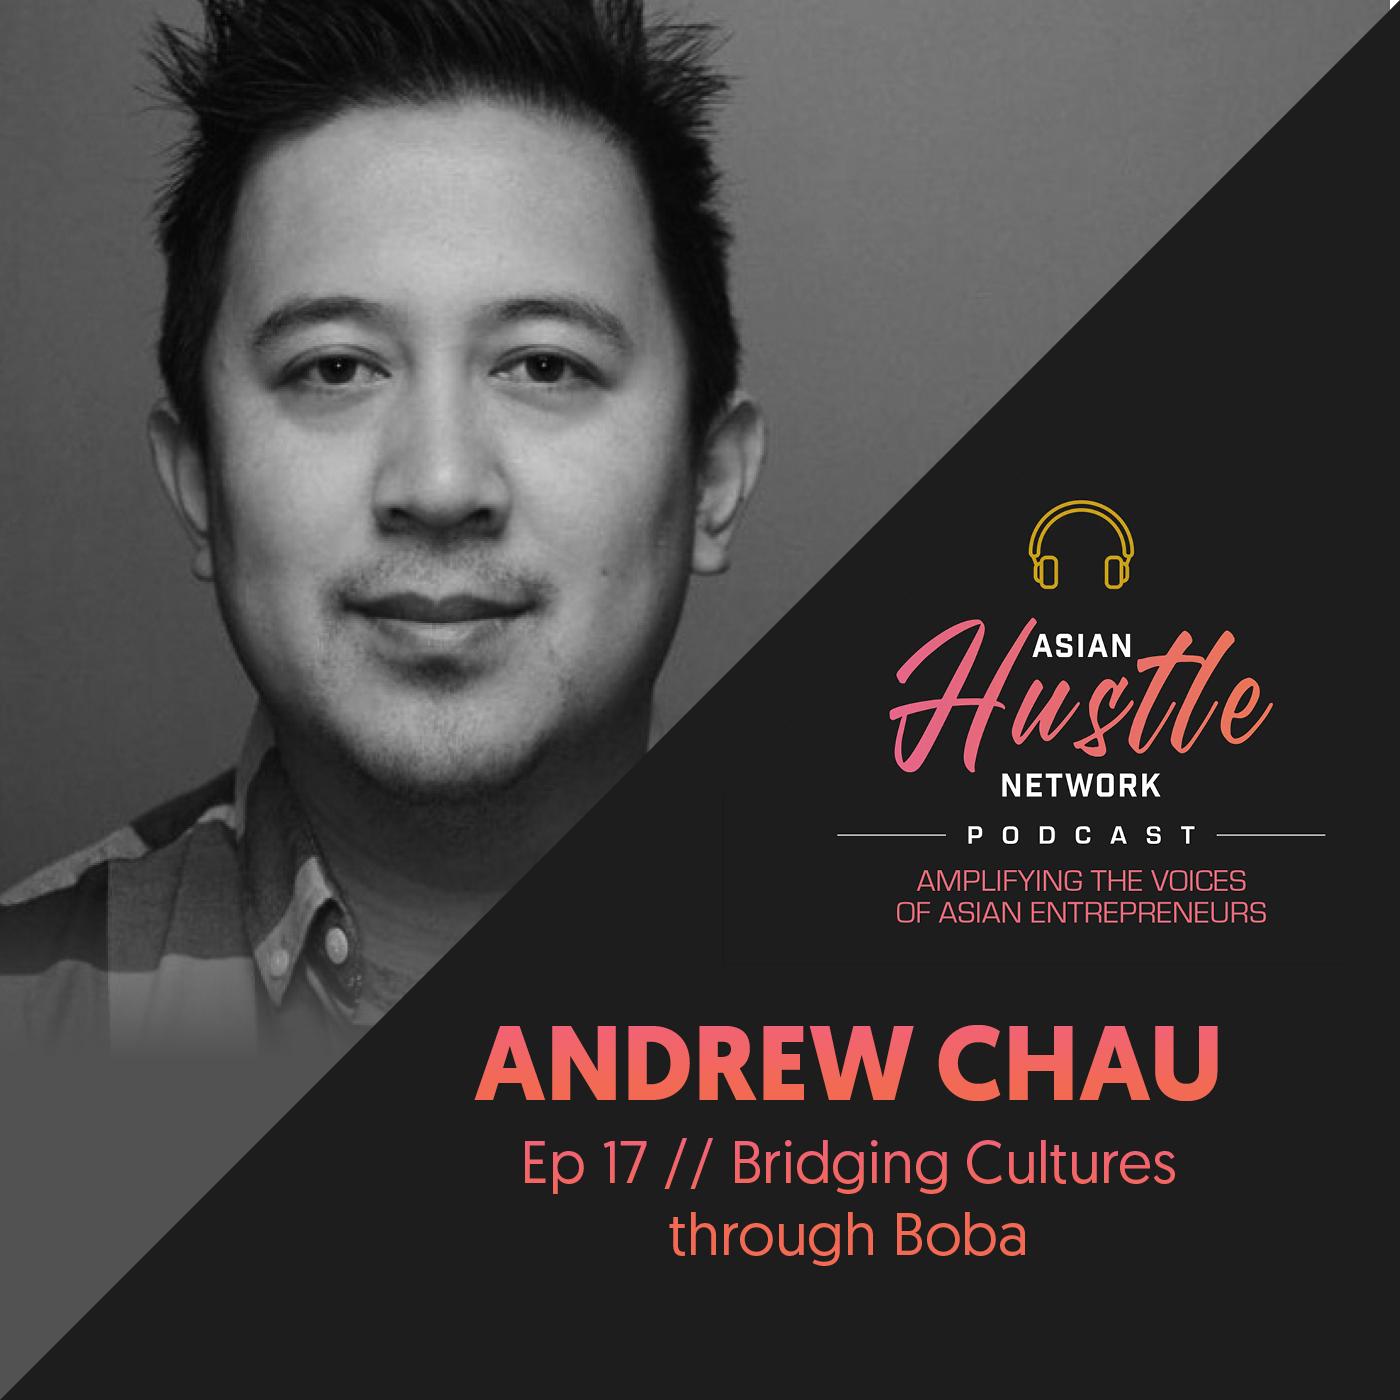 www.asianhustlenetwork.com: Andrew Chau // Ep 17 // Bridging Cultures through Boba